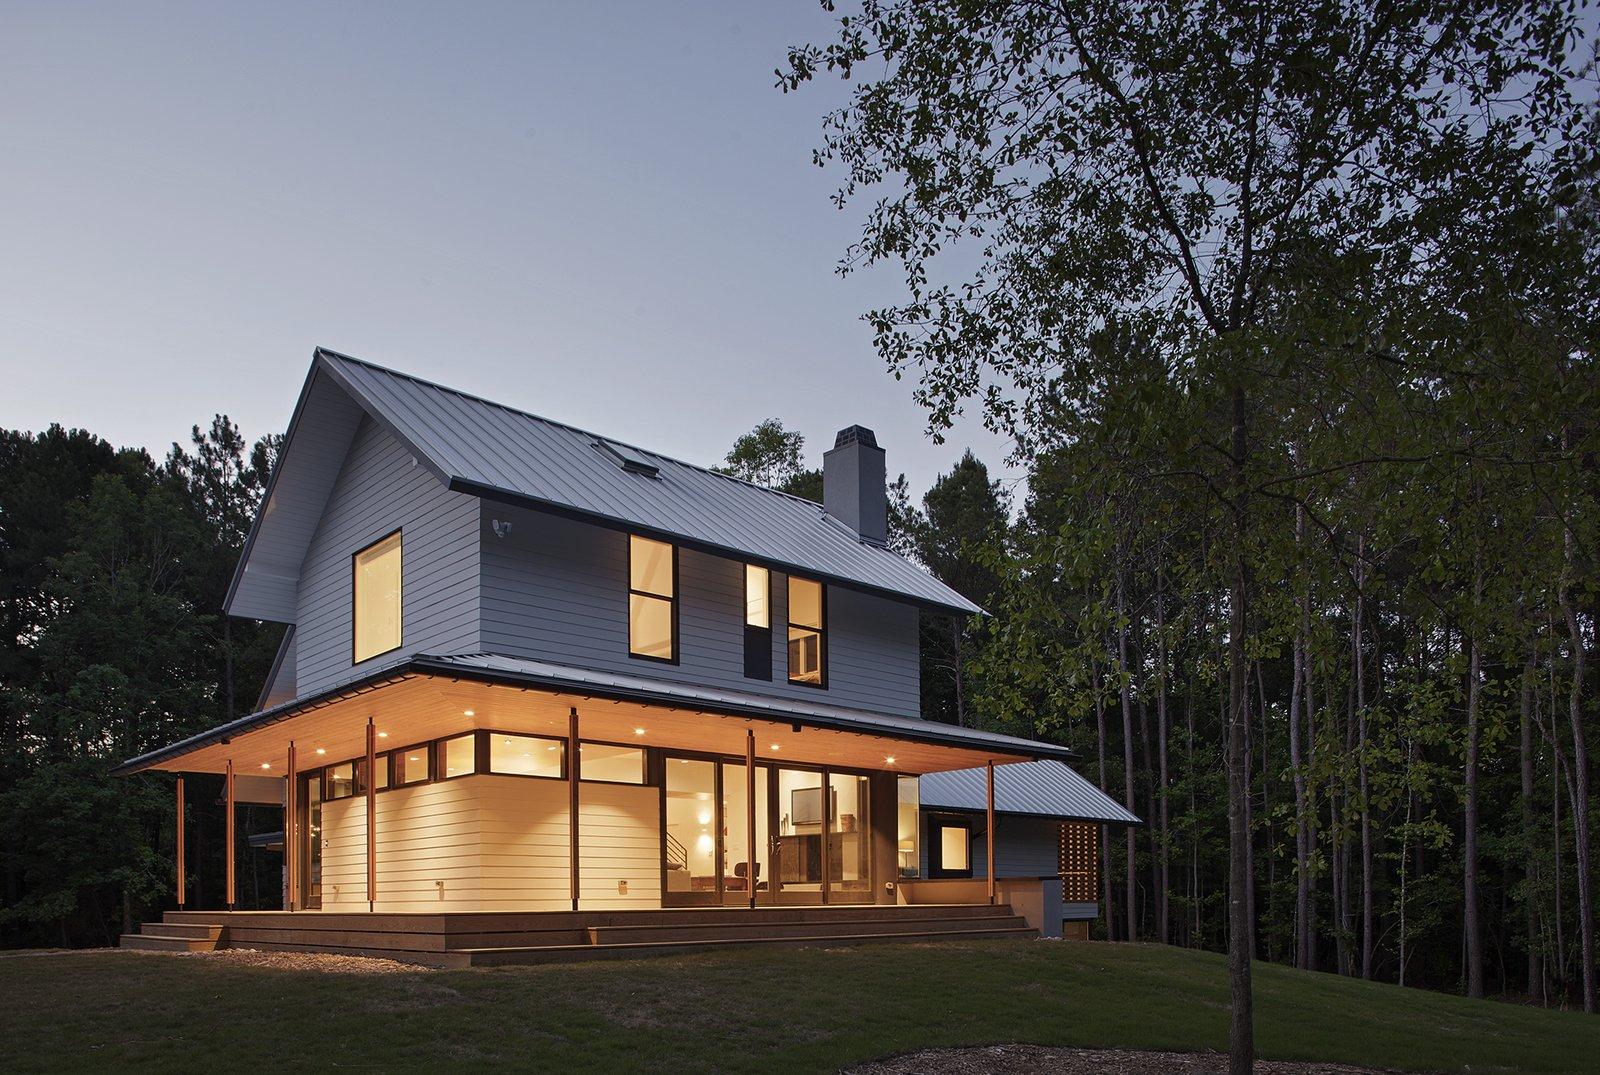 20 Modern Farmhouse Design Ideas